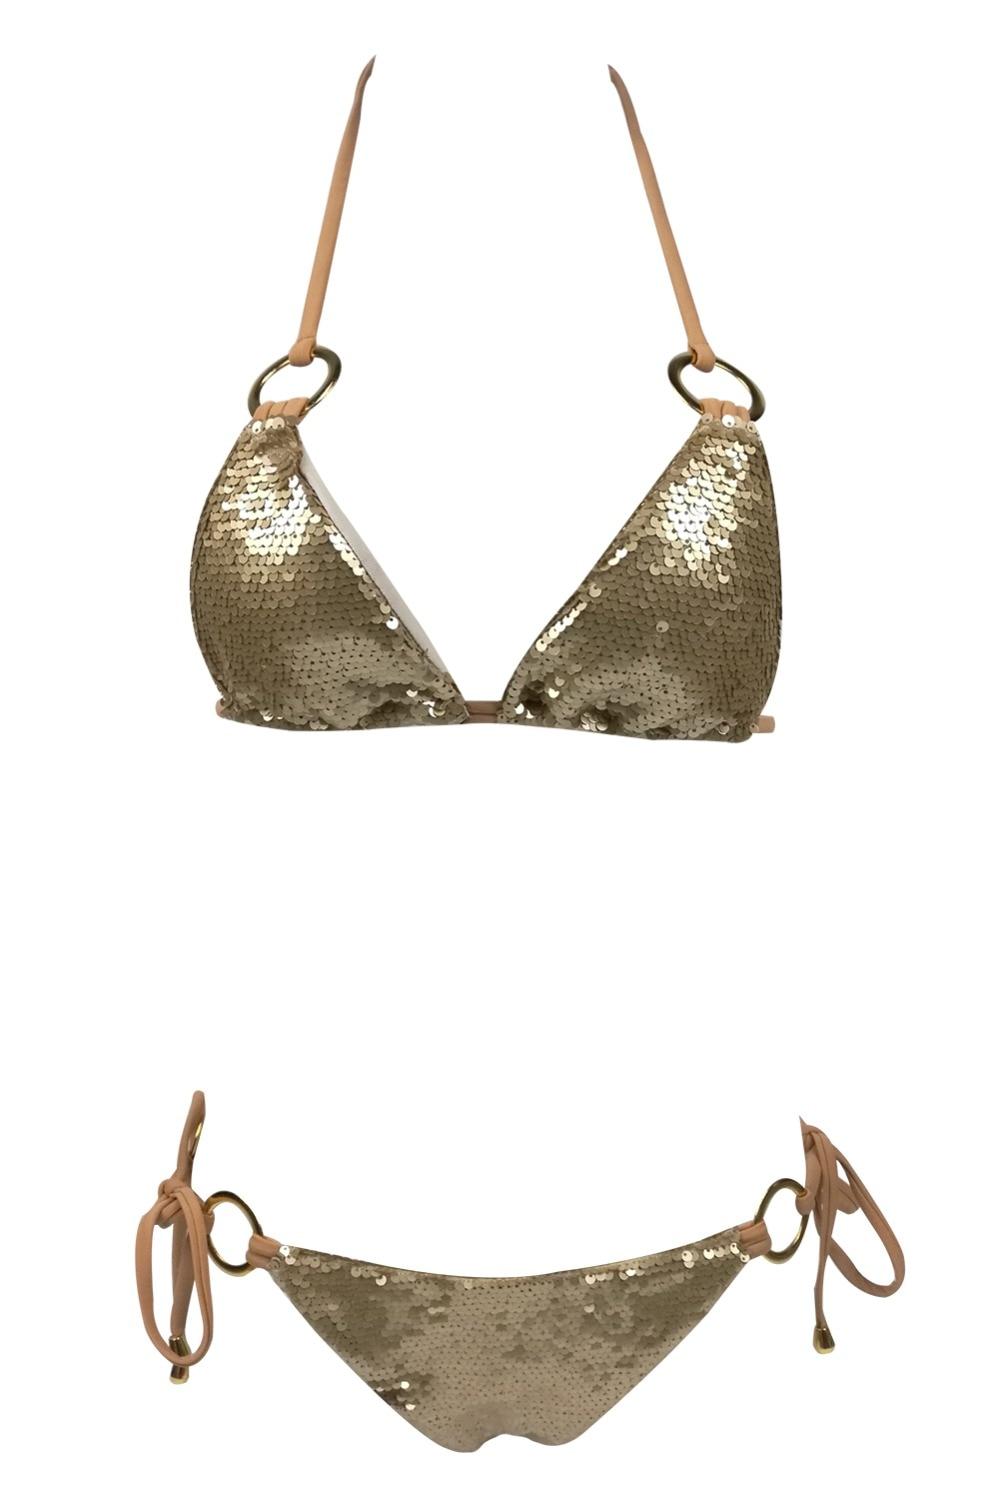 HTB1mBSQboLrK1Rjy1zbq6AenFXat 2019 Hot Sell Bikini Set Women Sexy Low Waist Bathing Suit Simple Sequins Beach Brazilian Swimsuit Halter Bandage Swimwear